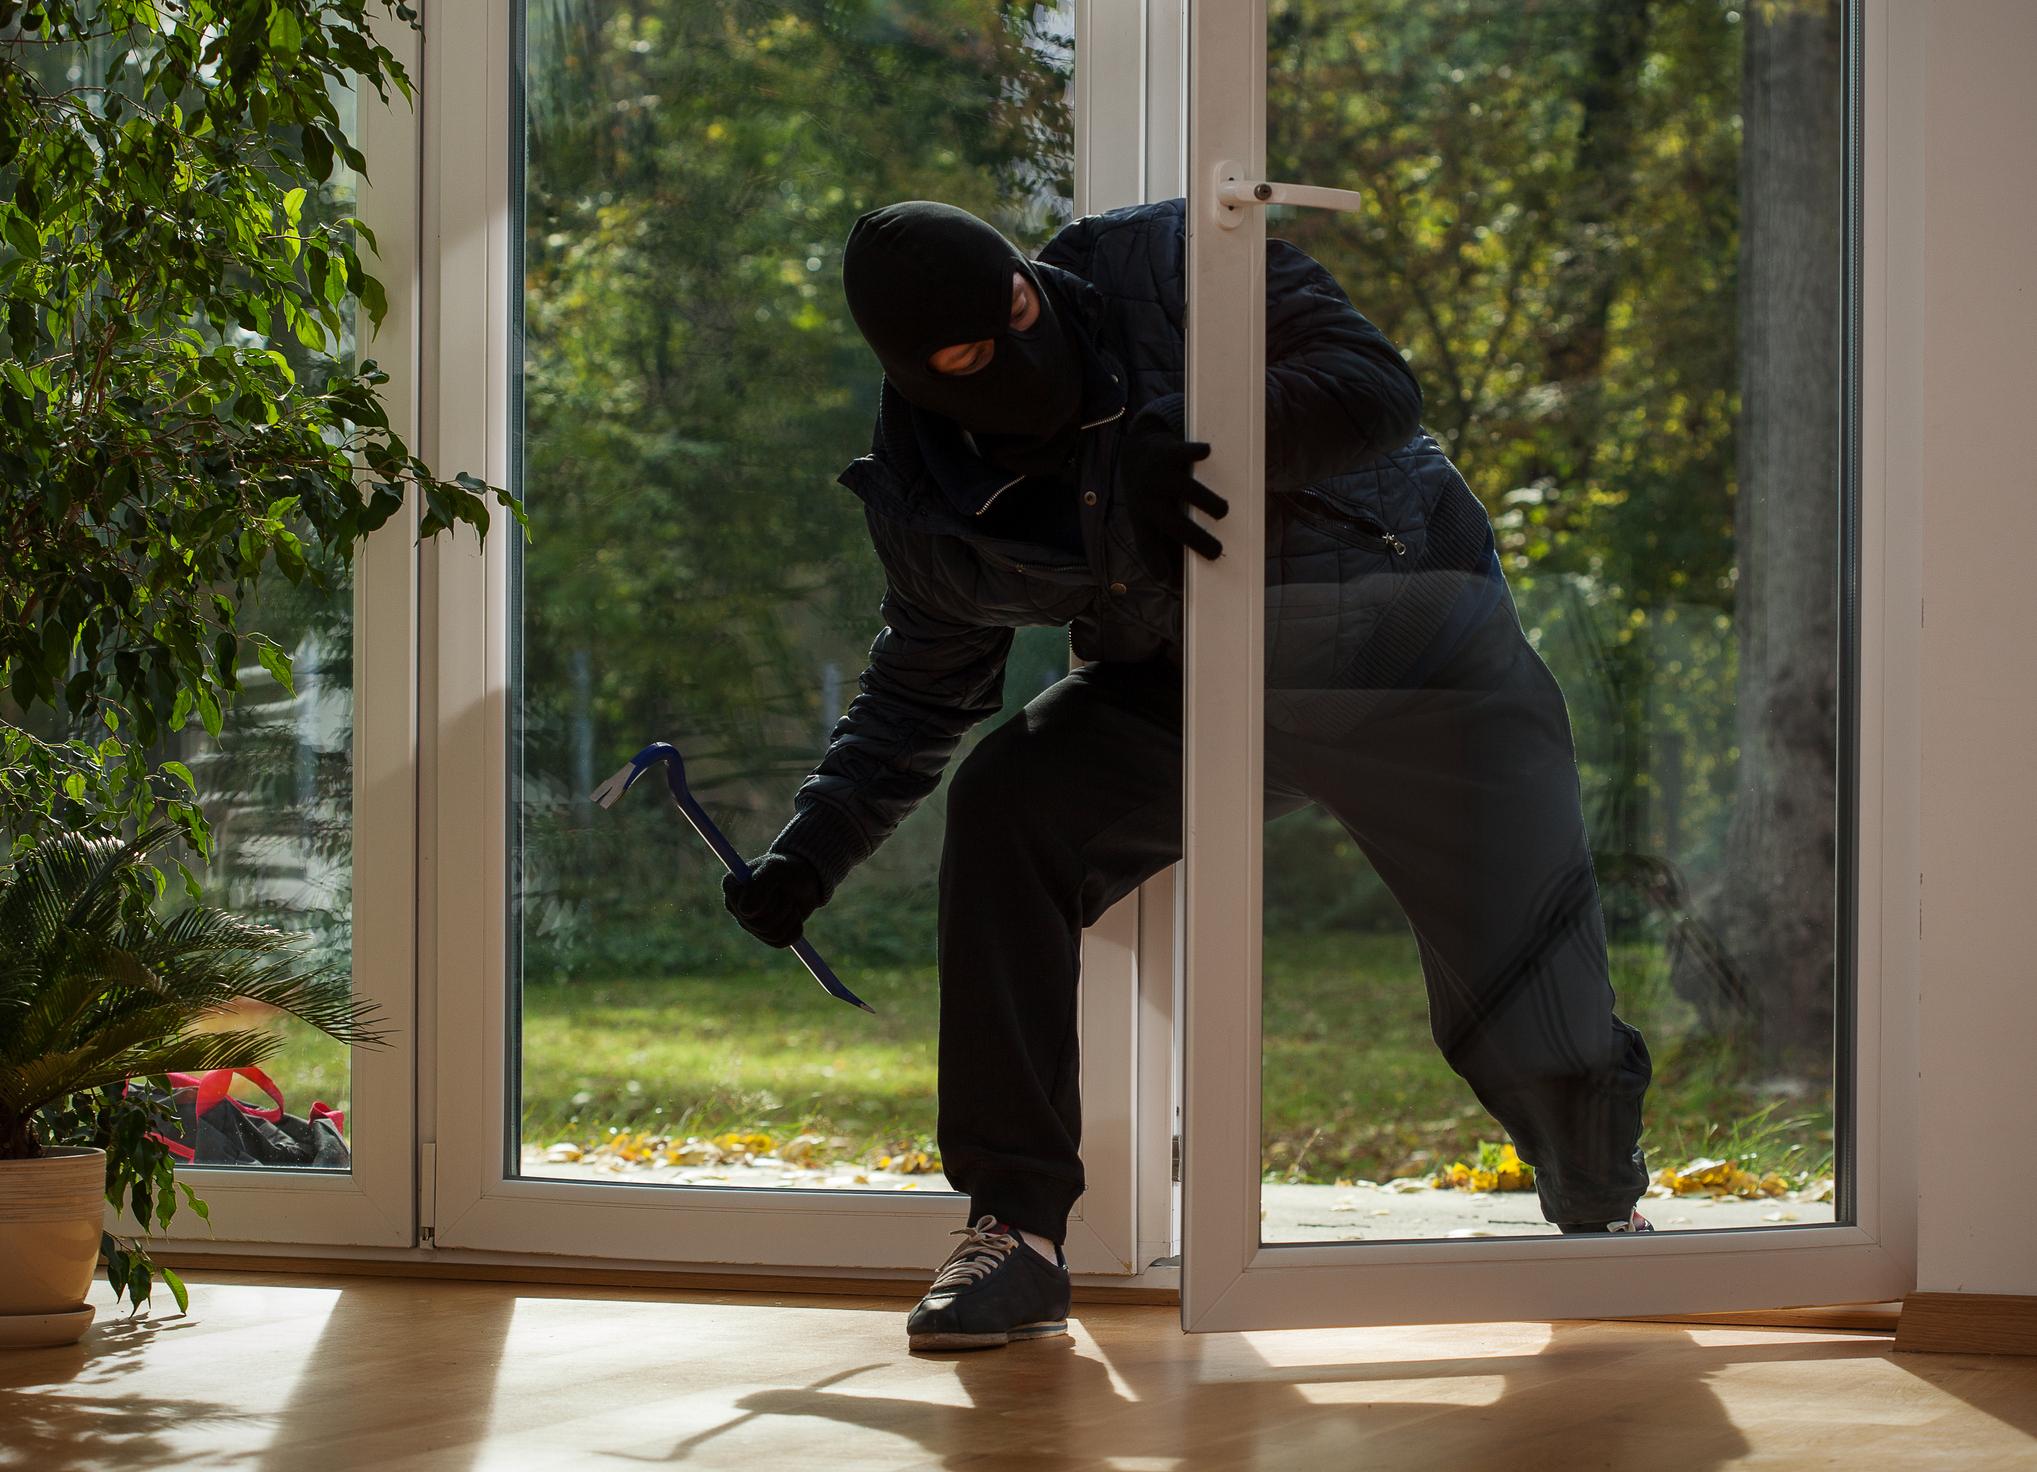 burglary_lawyer.jpg